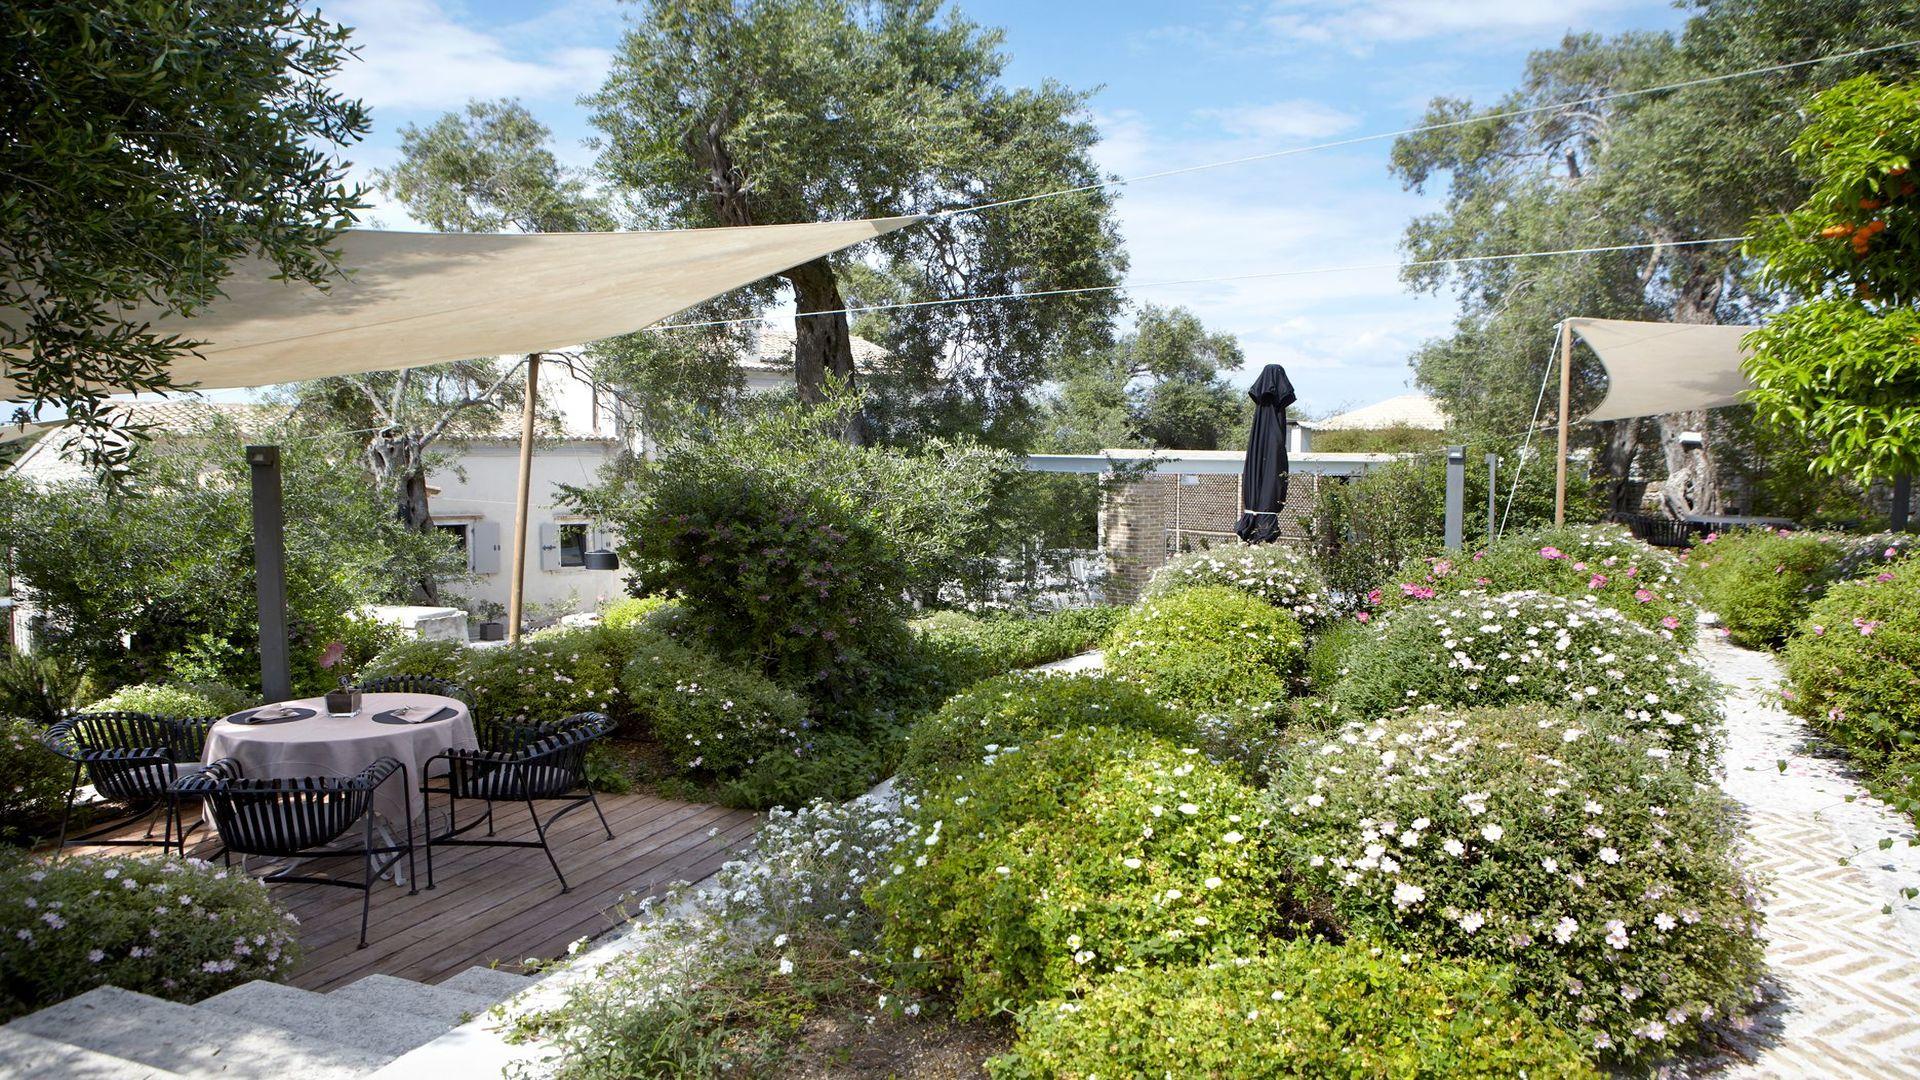 Mooi begroeide tuin Torri e Merli, Lakka, Paxos, Griekenland